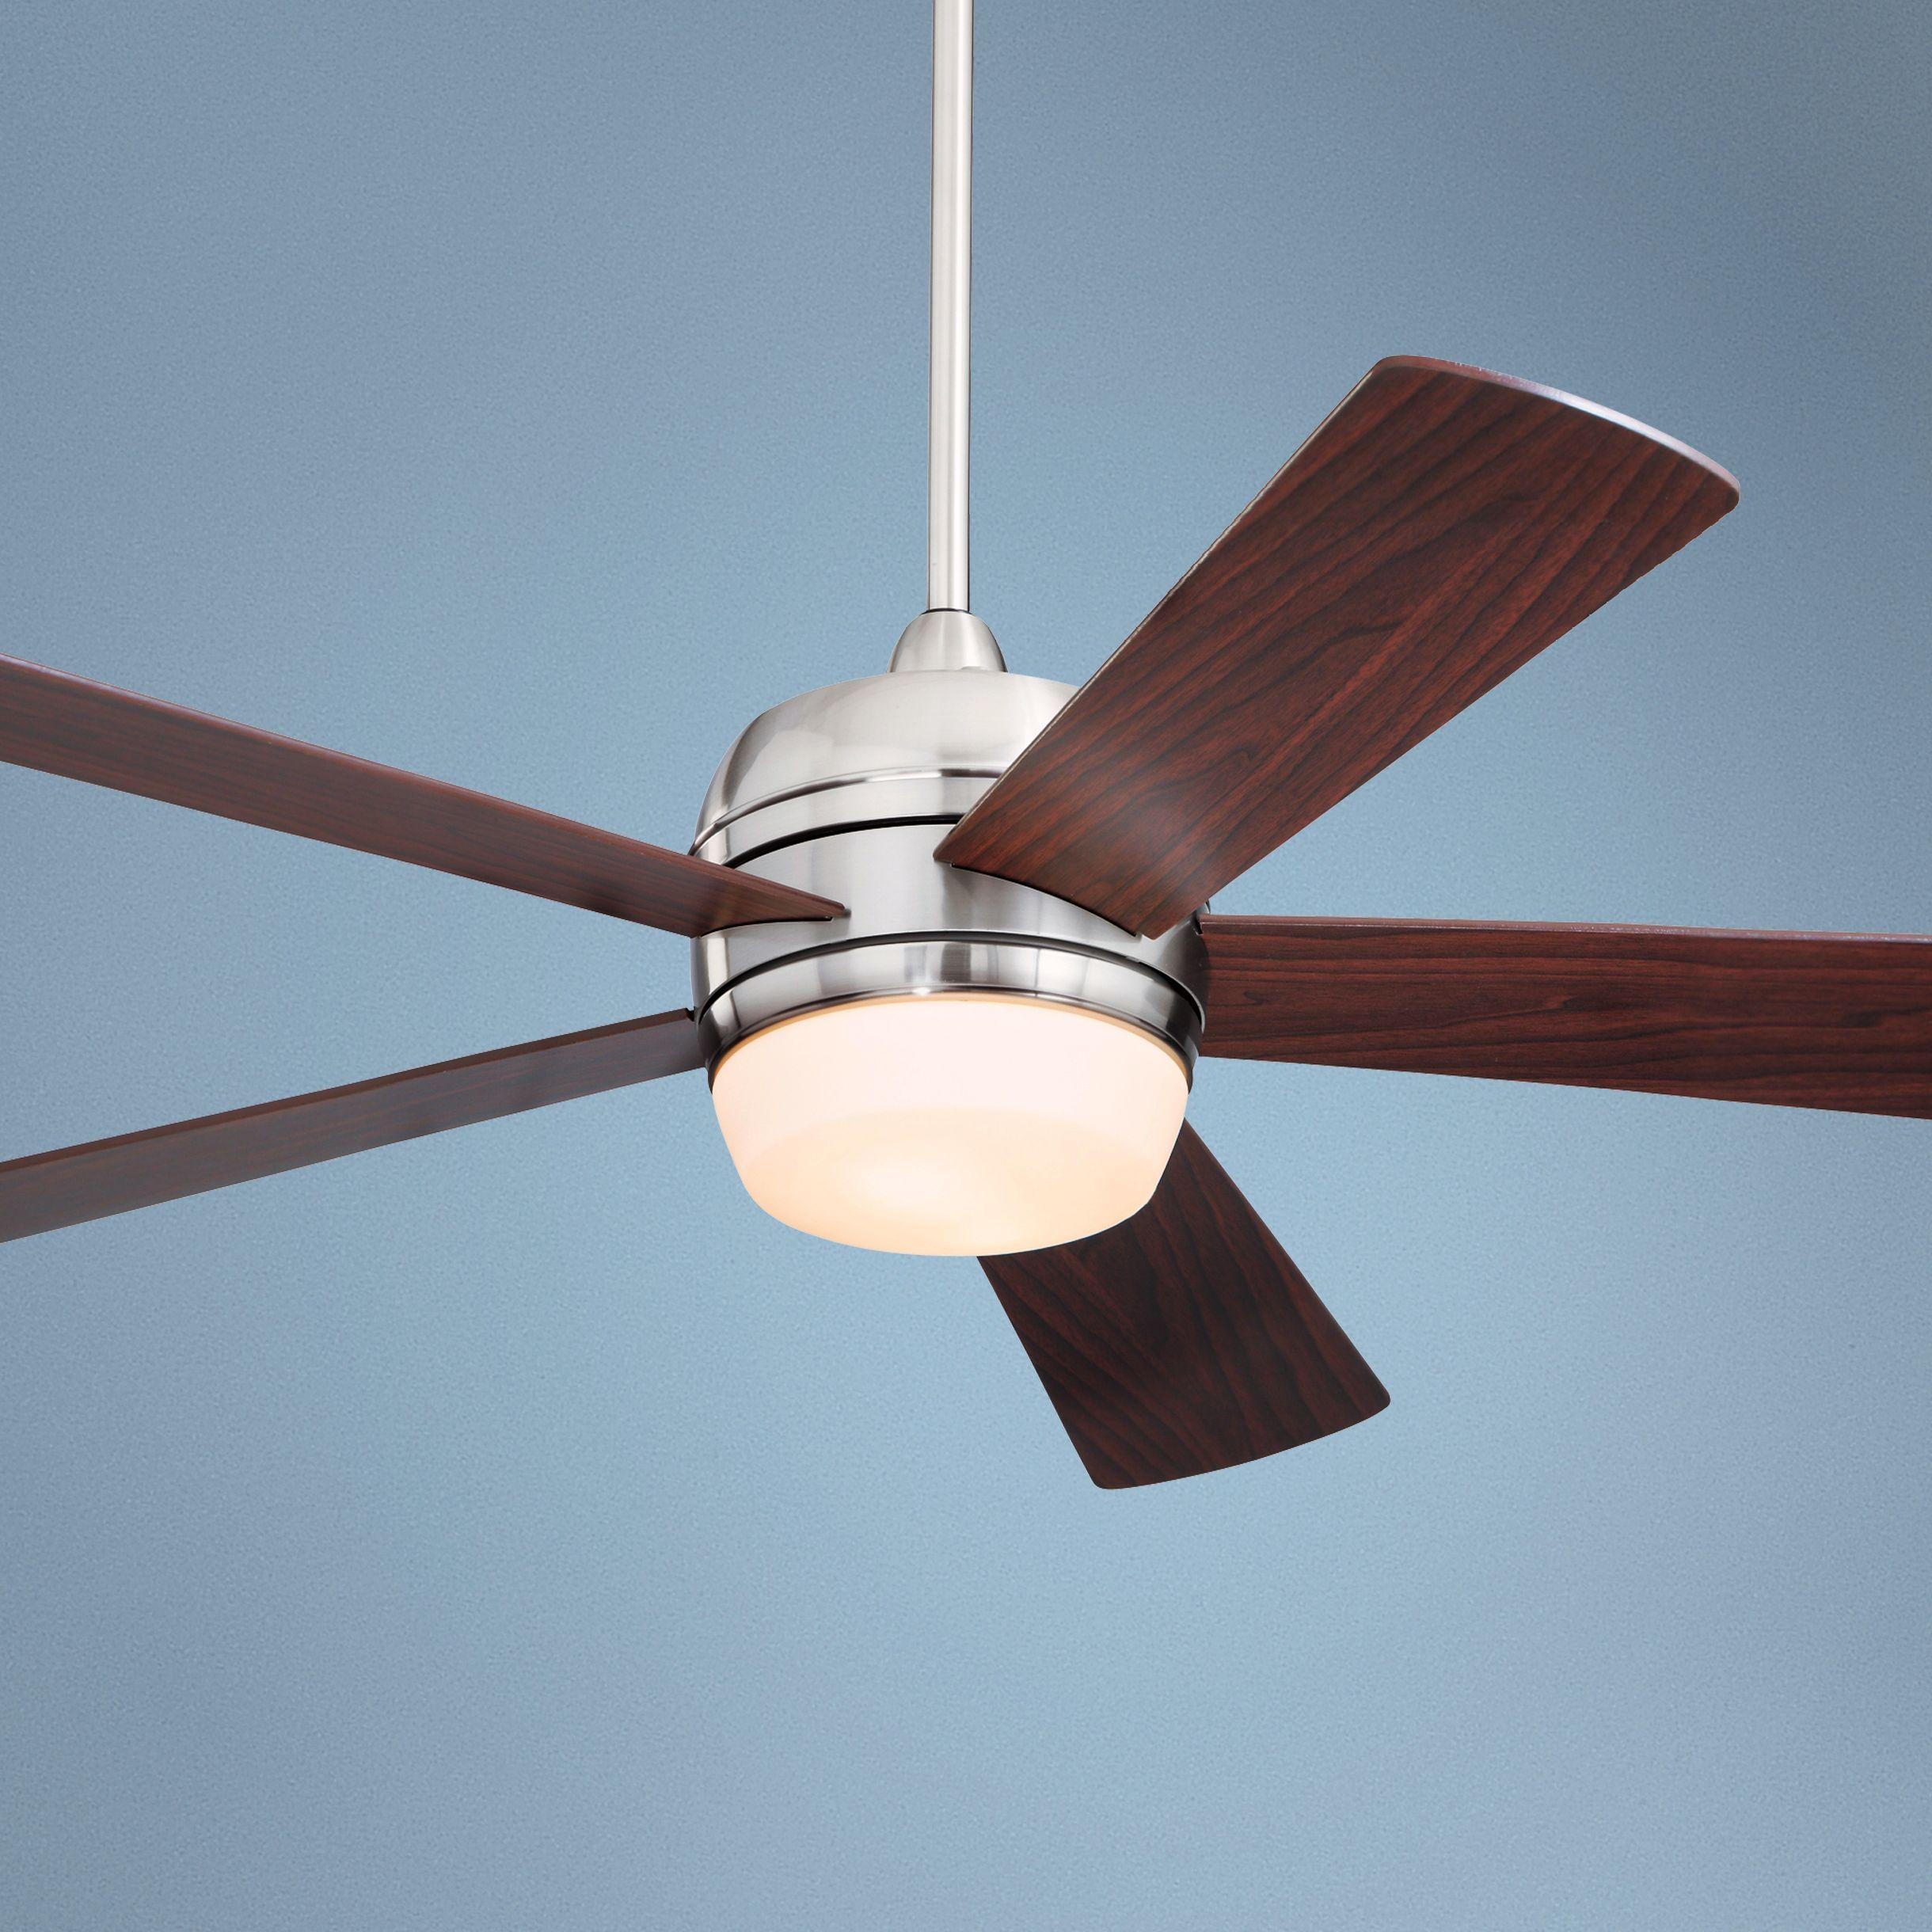 unique bedroom beautiful light of plus kit chandelier lowes lighting fans ceiling fan lamps